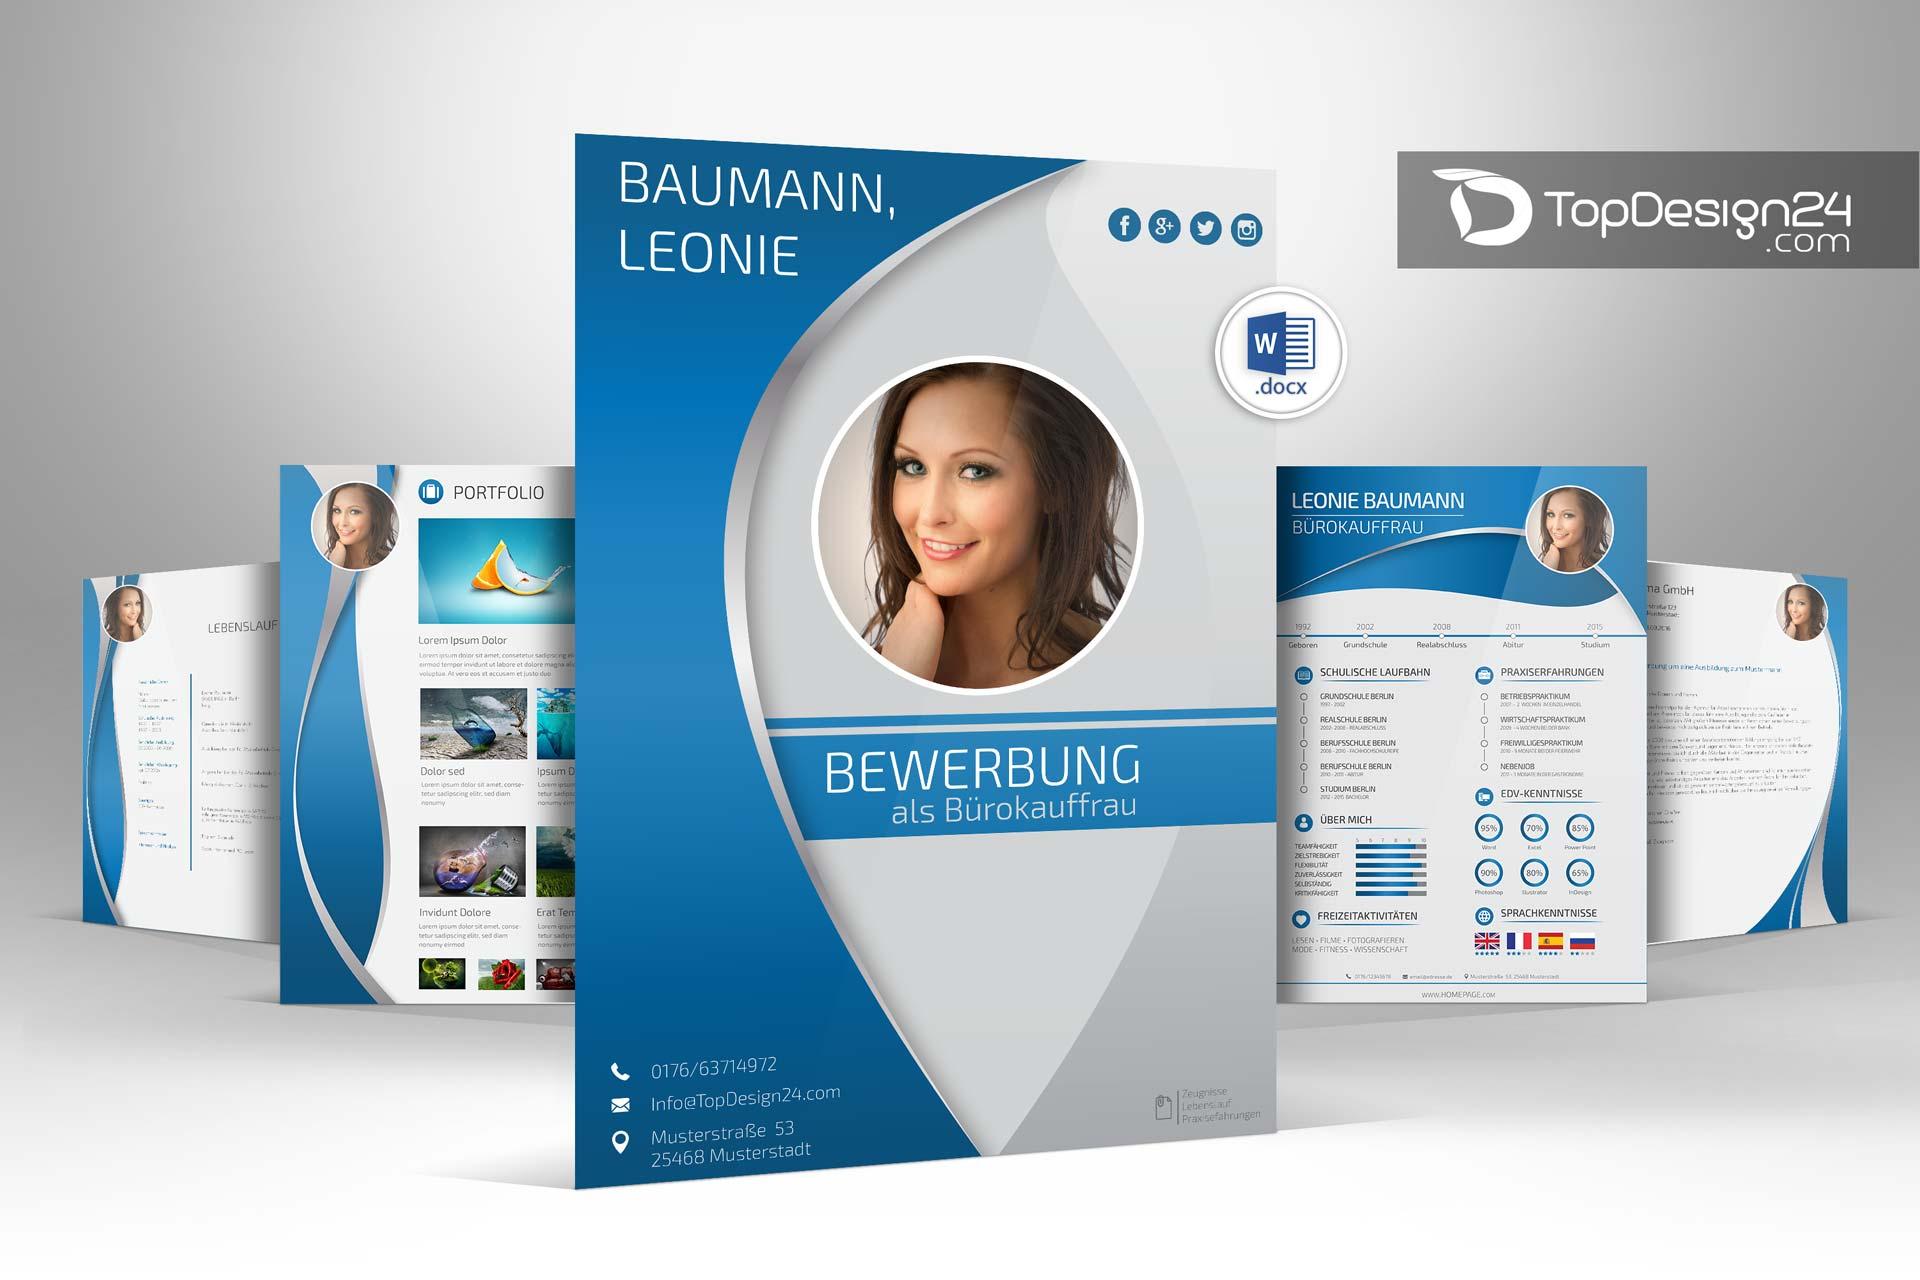 Bewerbung Design Topdesign24 Klassischstilvollmodern